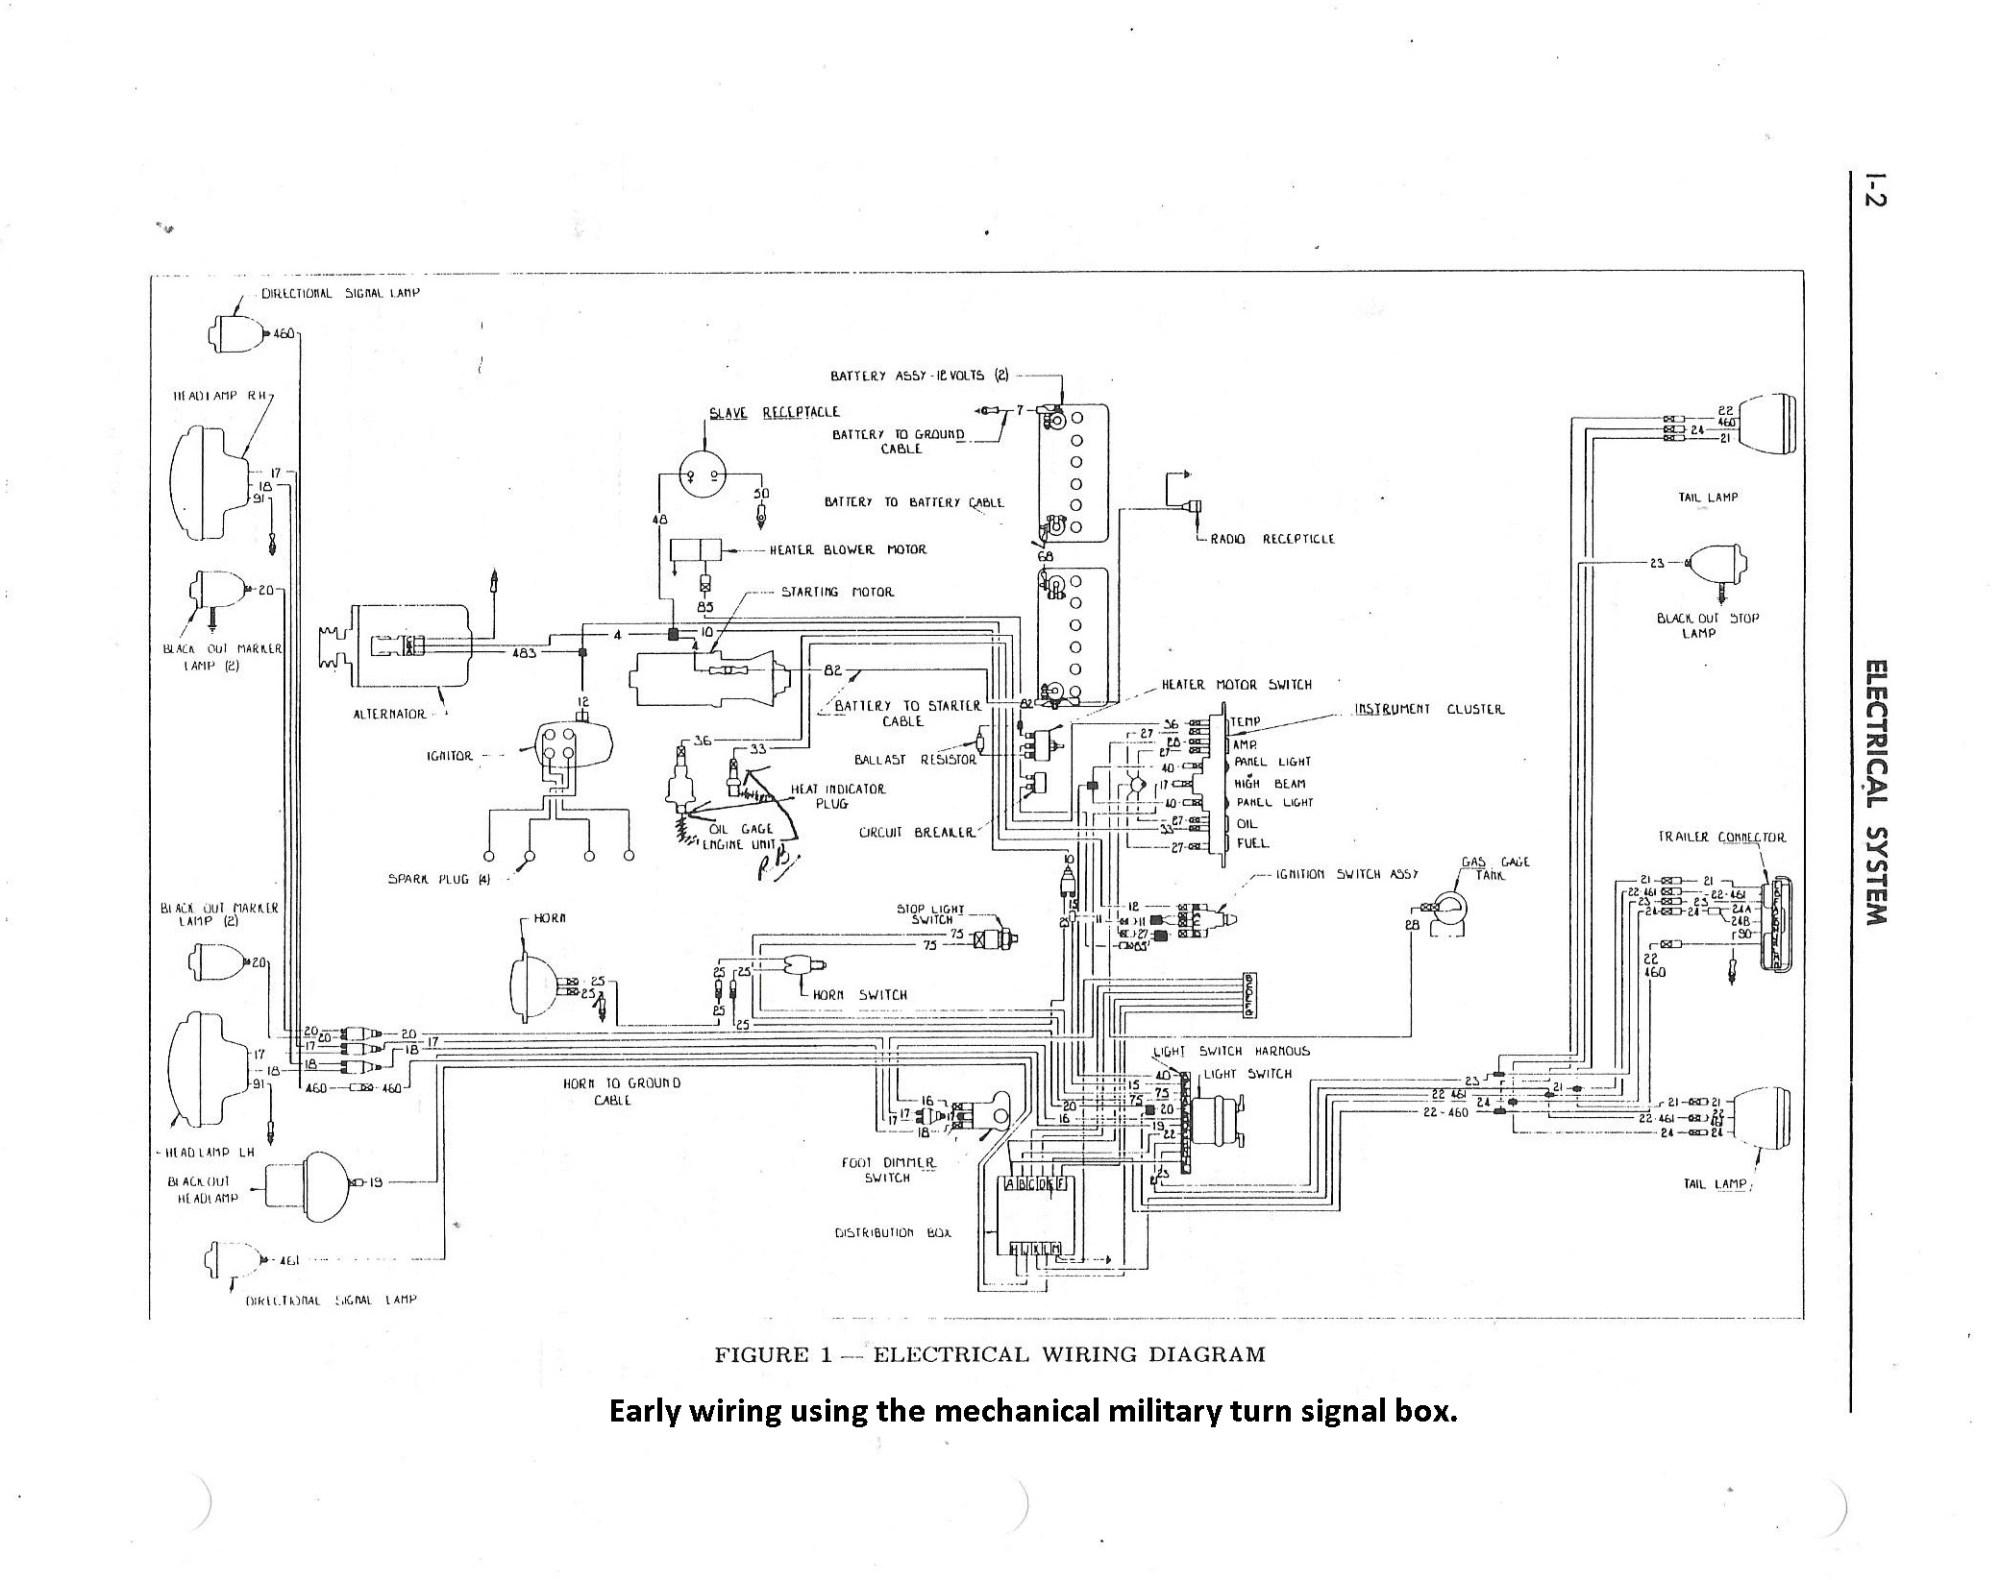 hight resolution of m38a1 wiring diagram 7 18 sg dbd de u2022m38a1 light switch diagram m38a1 free engine